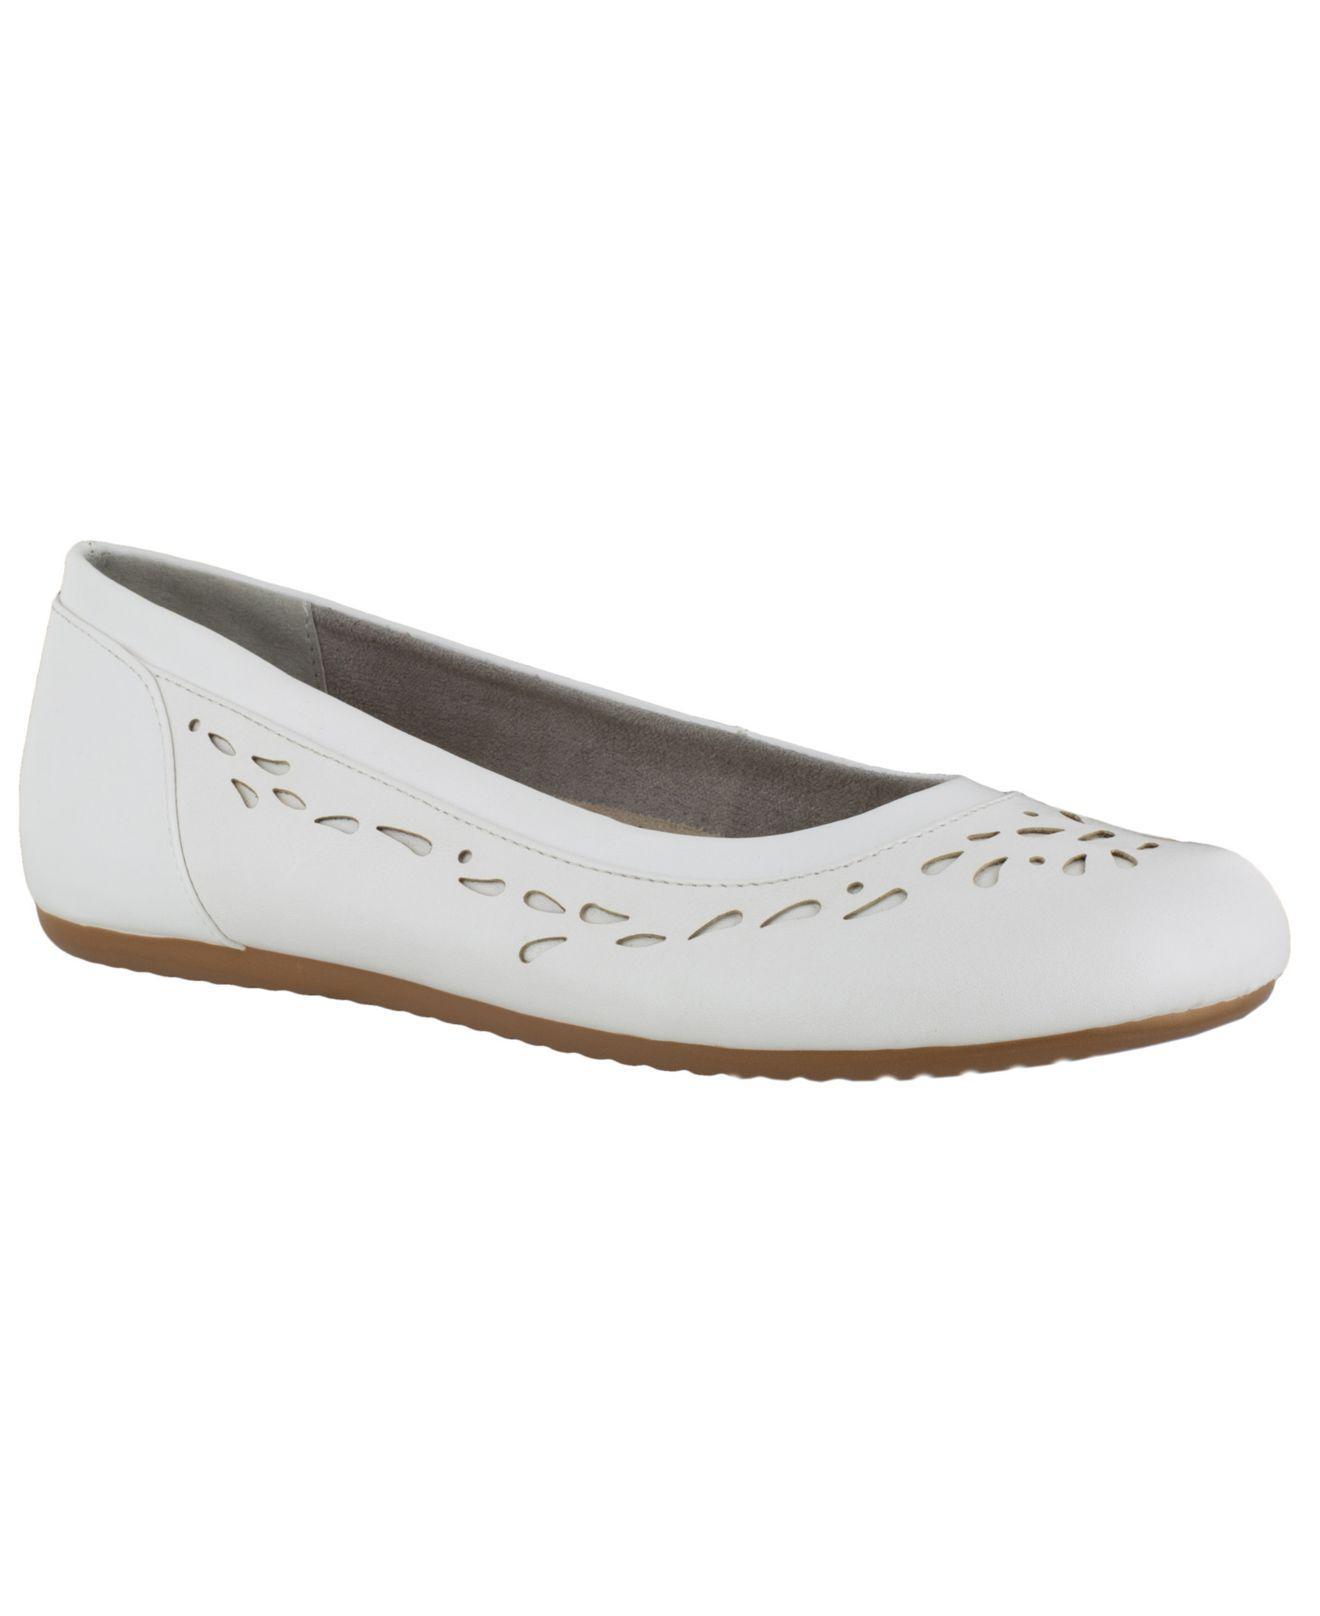 625abe88213a Lyst - Easy Street Easy Steet Bridget Ballet Flats in White